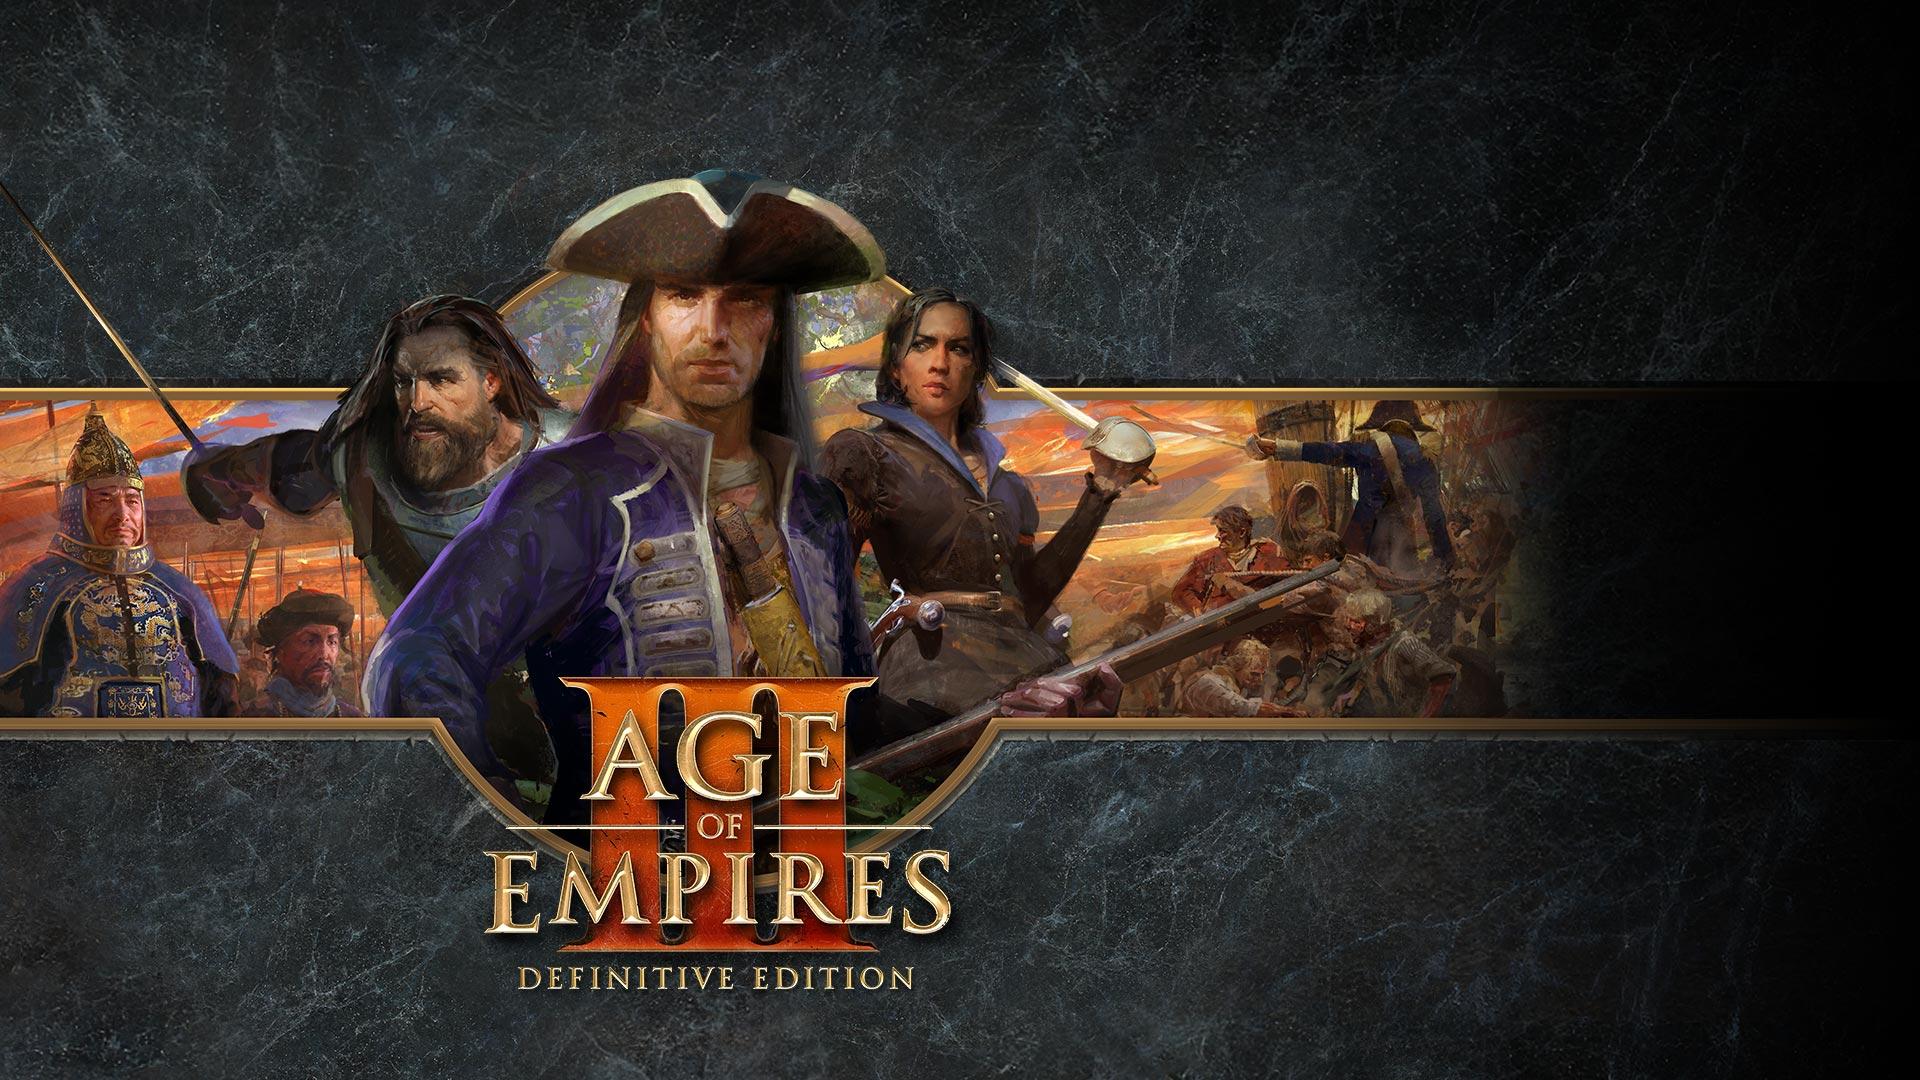 Постер Age of Empires III: Definitive Edition